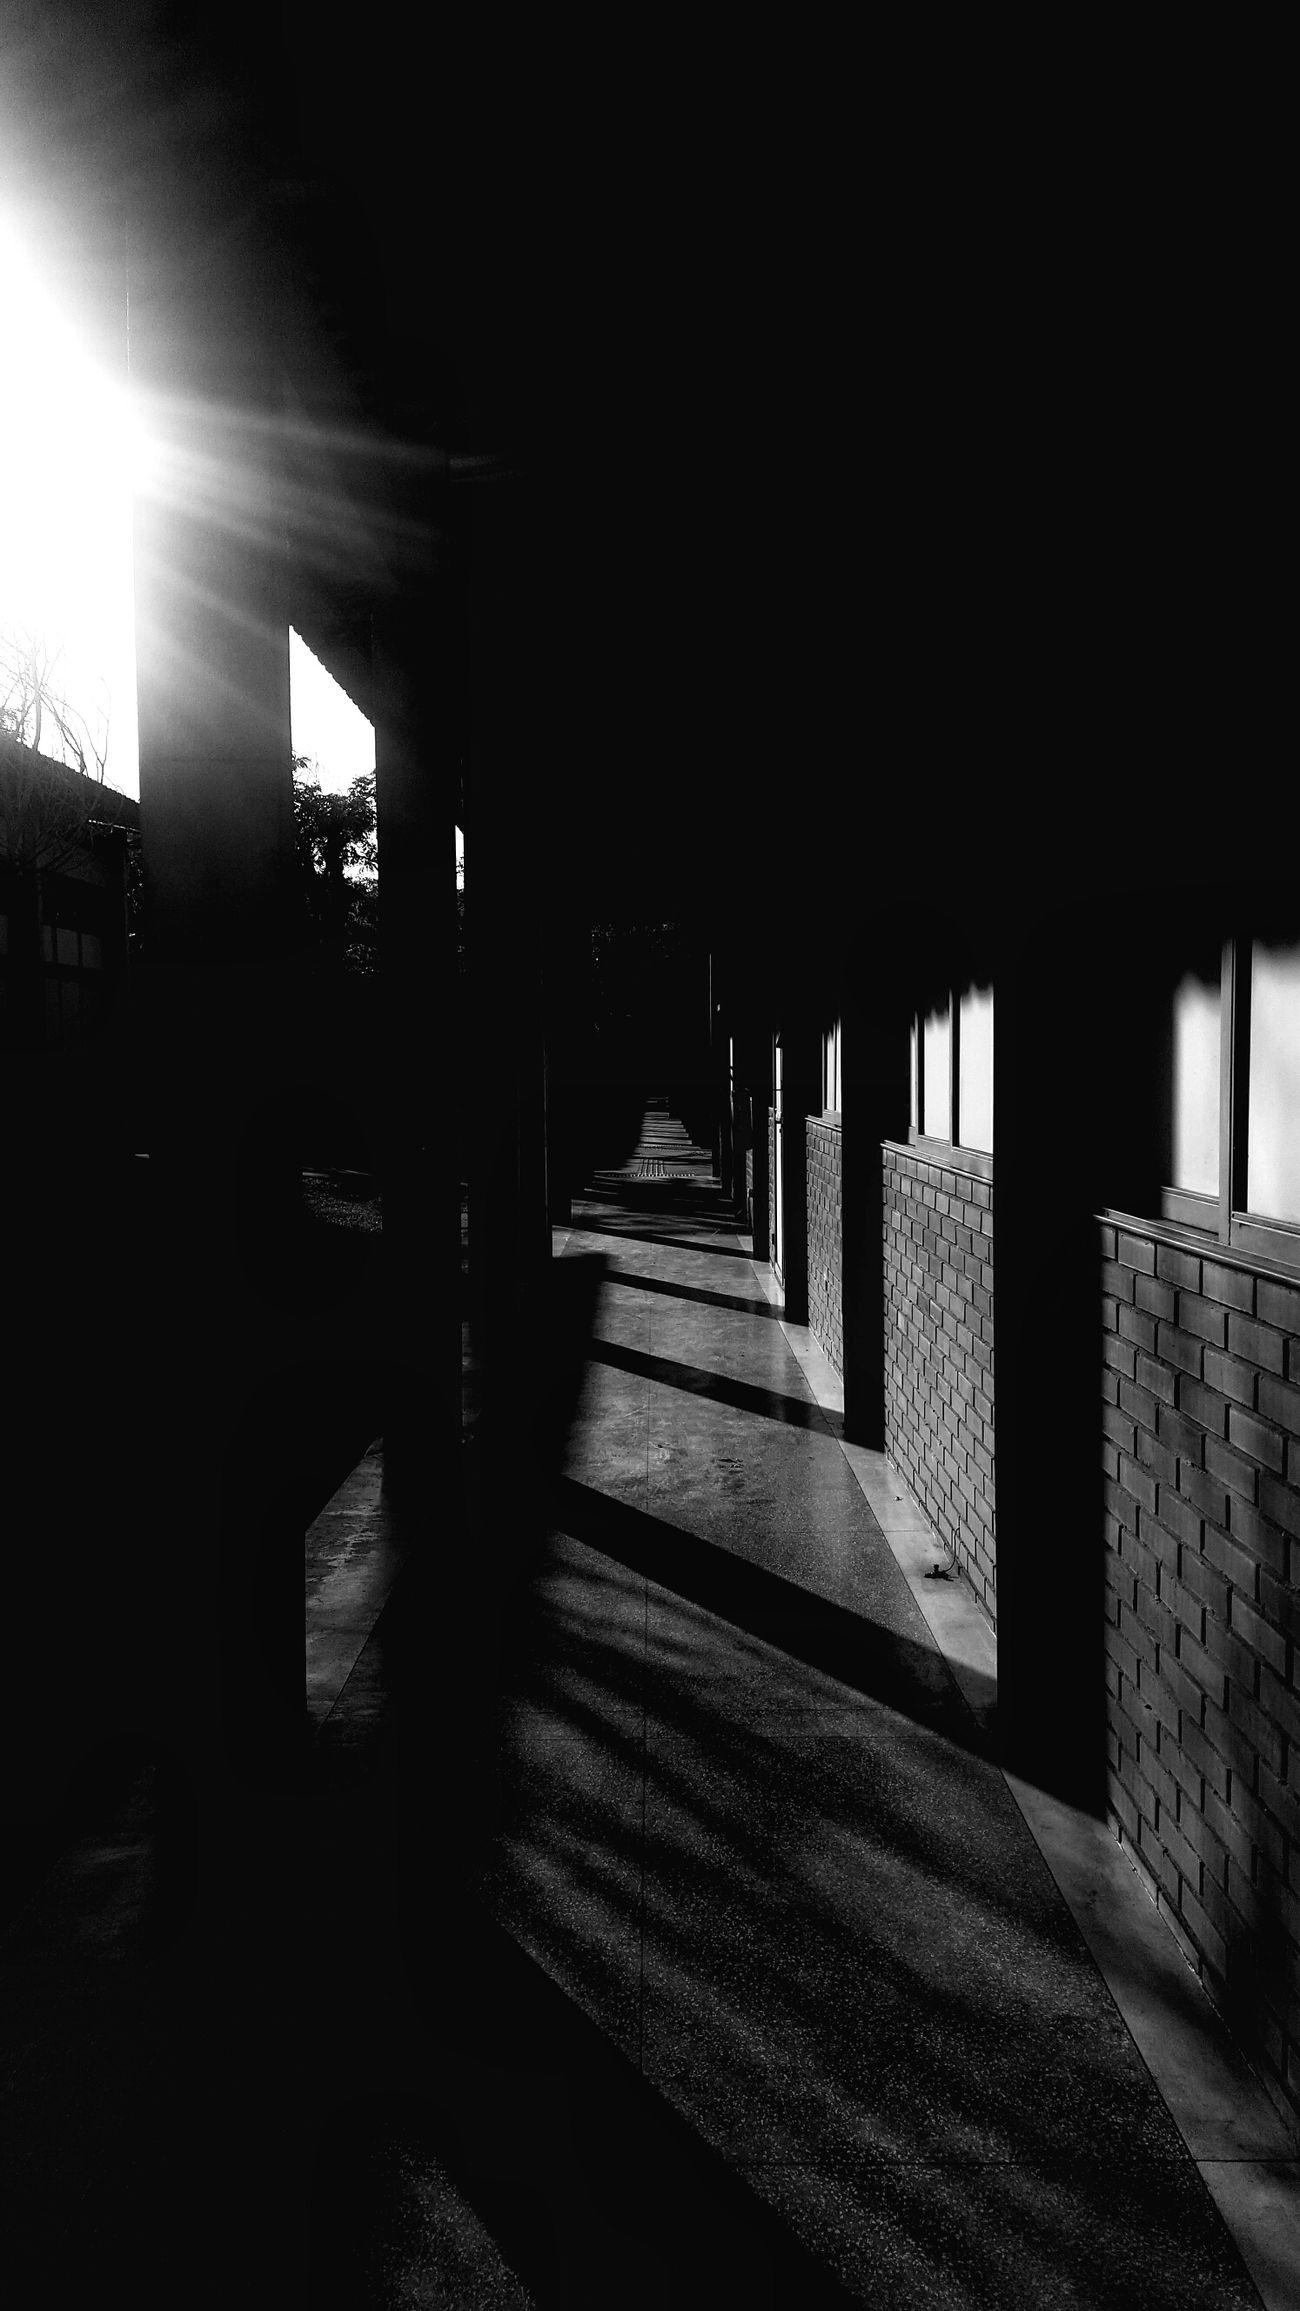 The City Light Blackandwhite Blackandwhite Photography EyeEmBestPics CampoGrande,MS EyeEm Best Shots EyeEm Gallery Eyeemphotography TheWeekOnEyeEM S6edgephotography S6 Edge Photography Shadow Sunlight S6edge